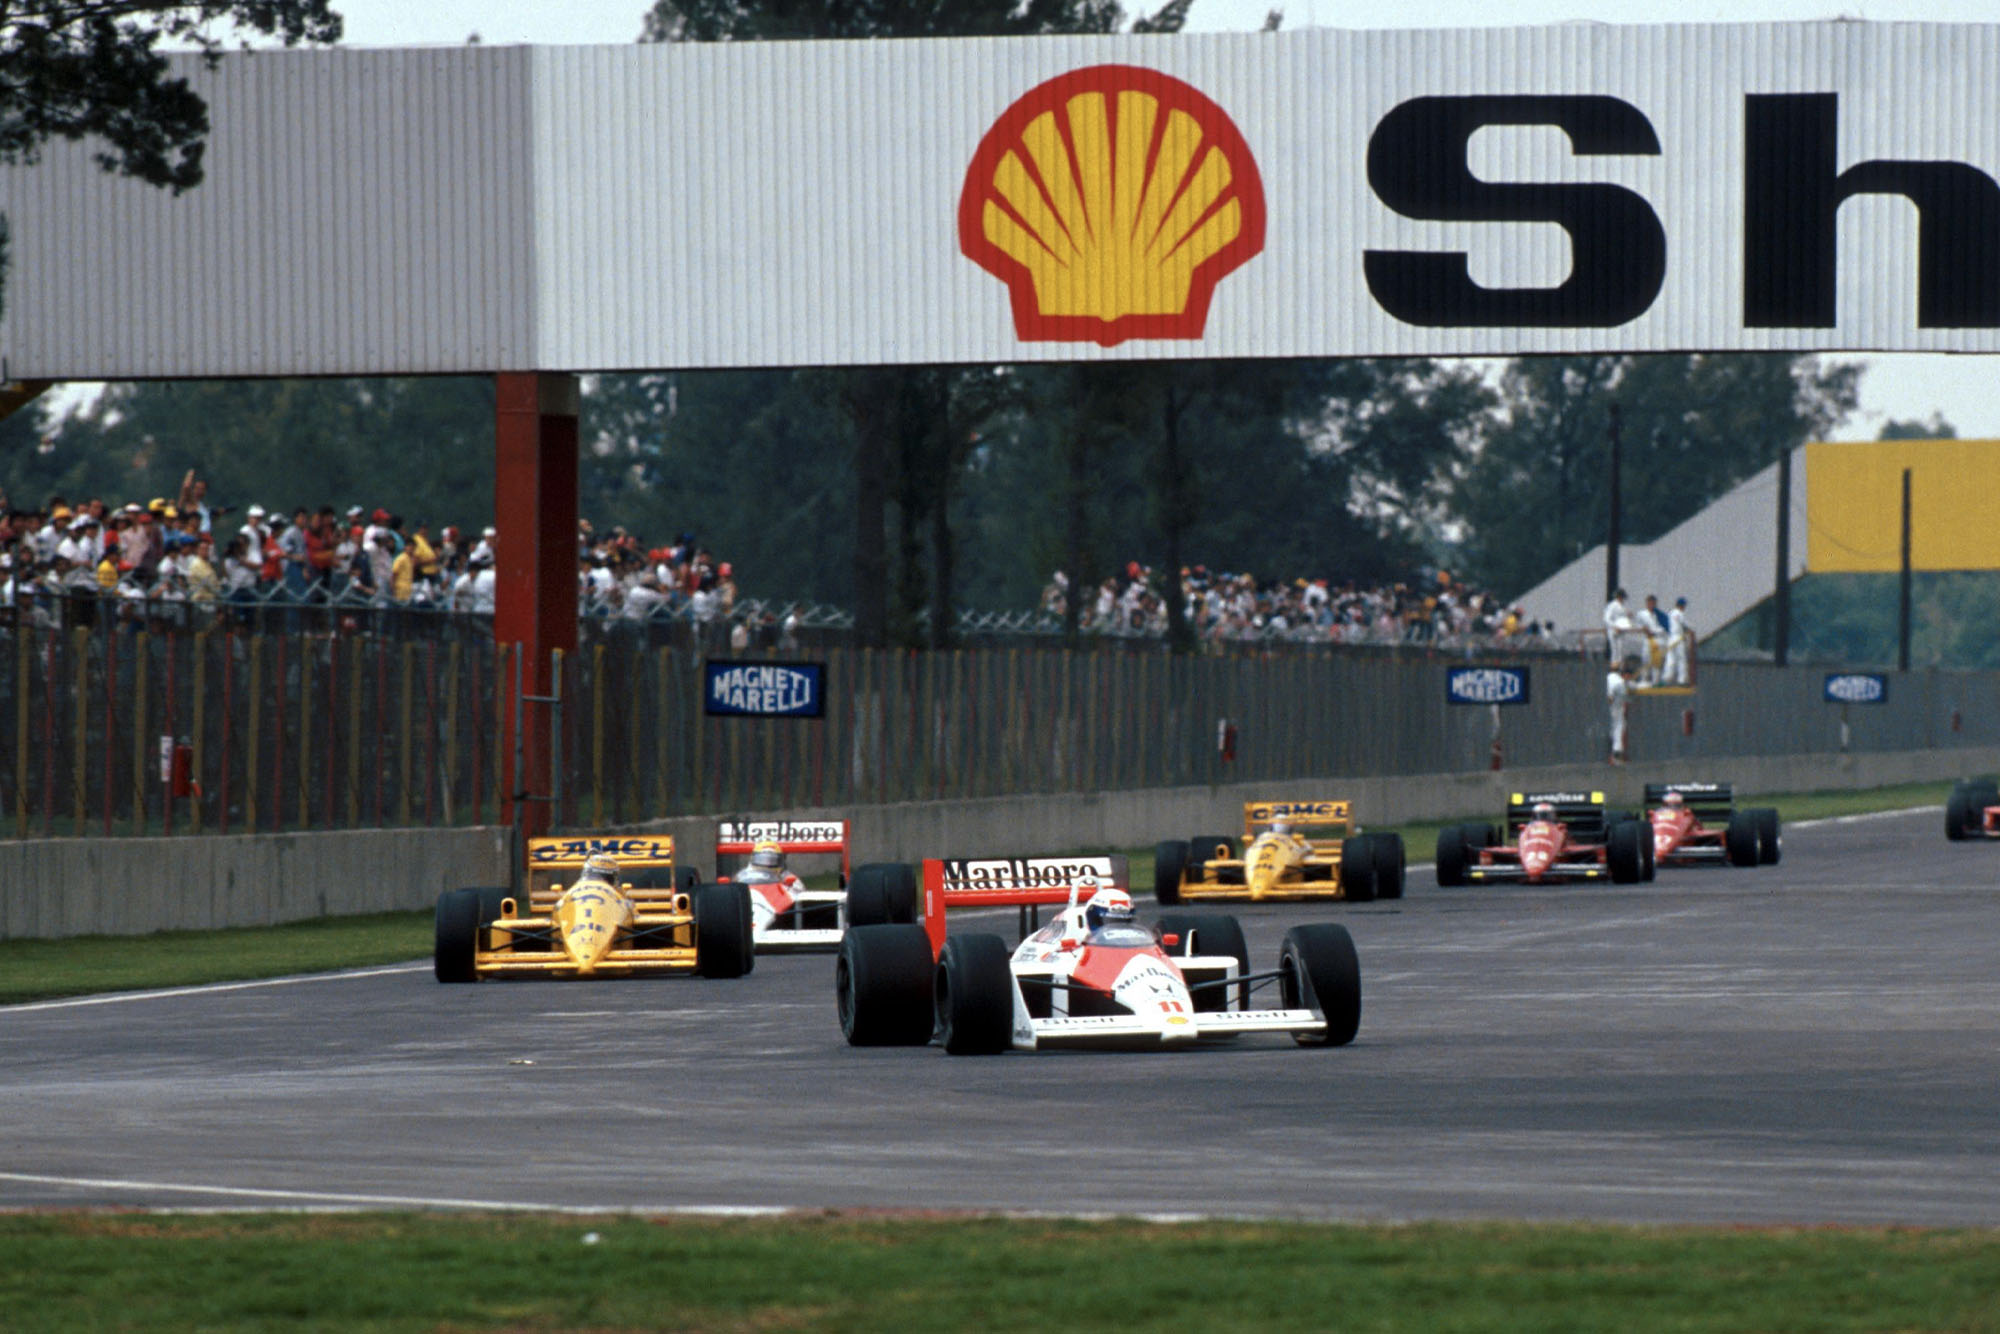 1988 Mexican GP start